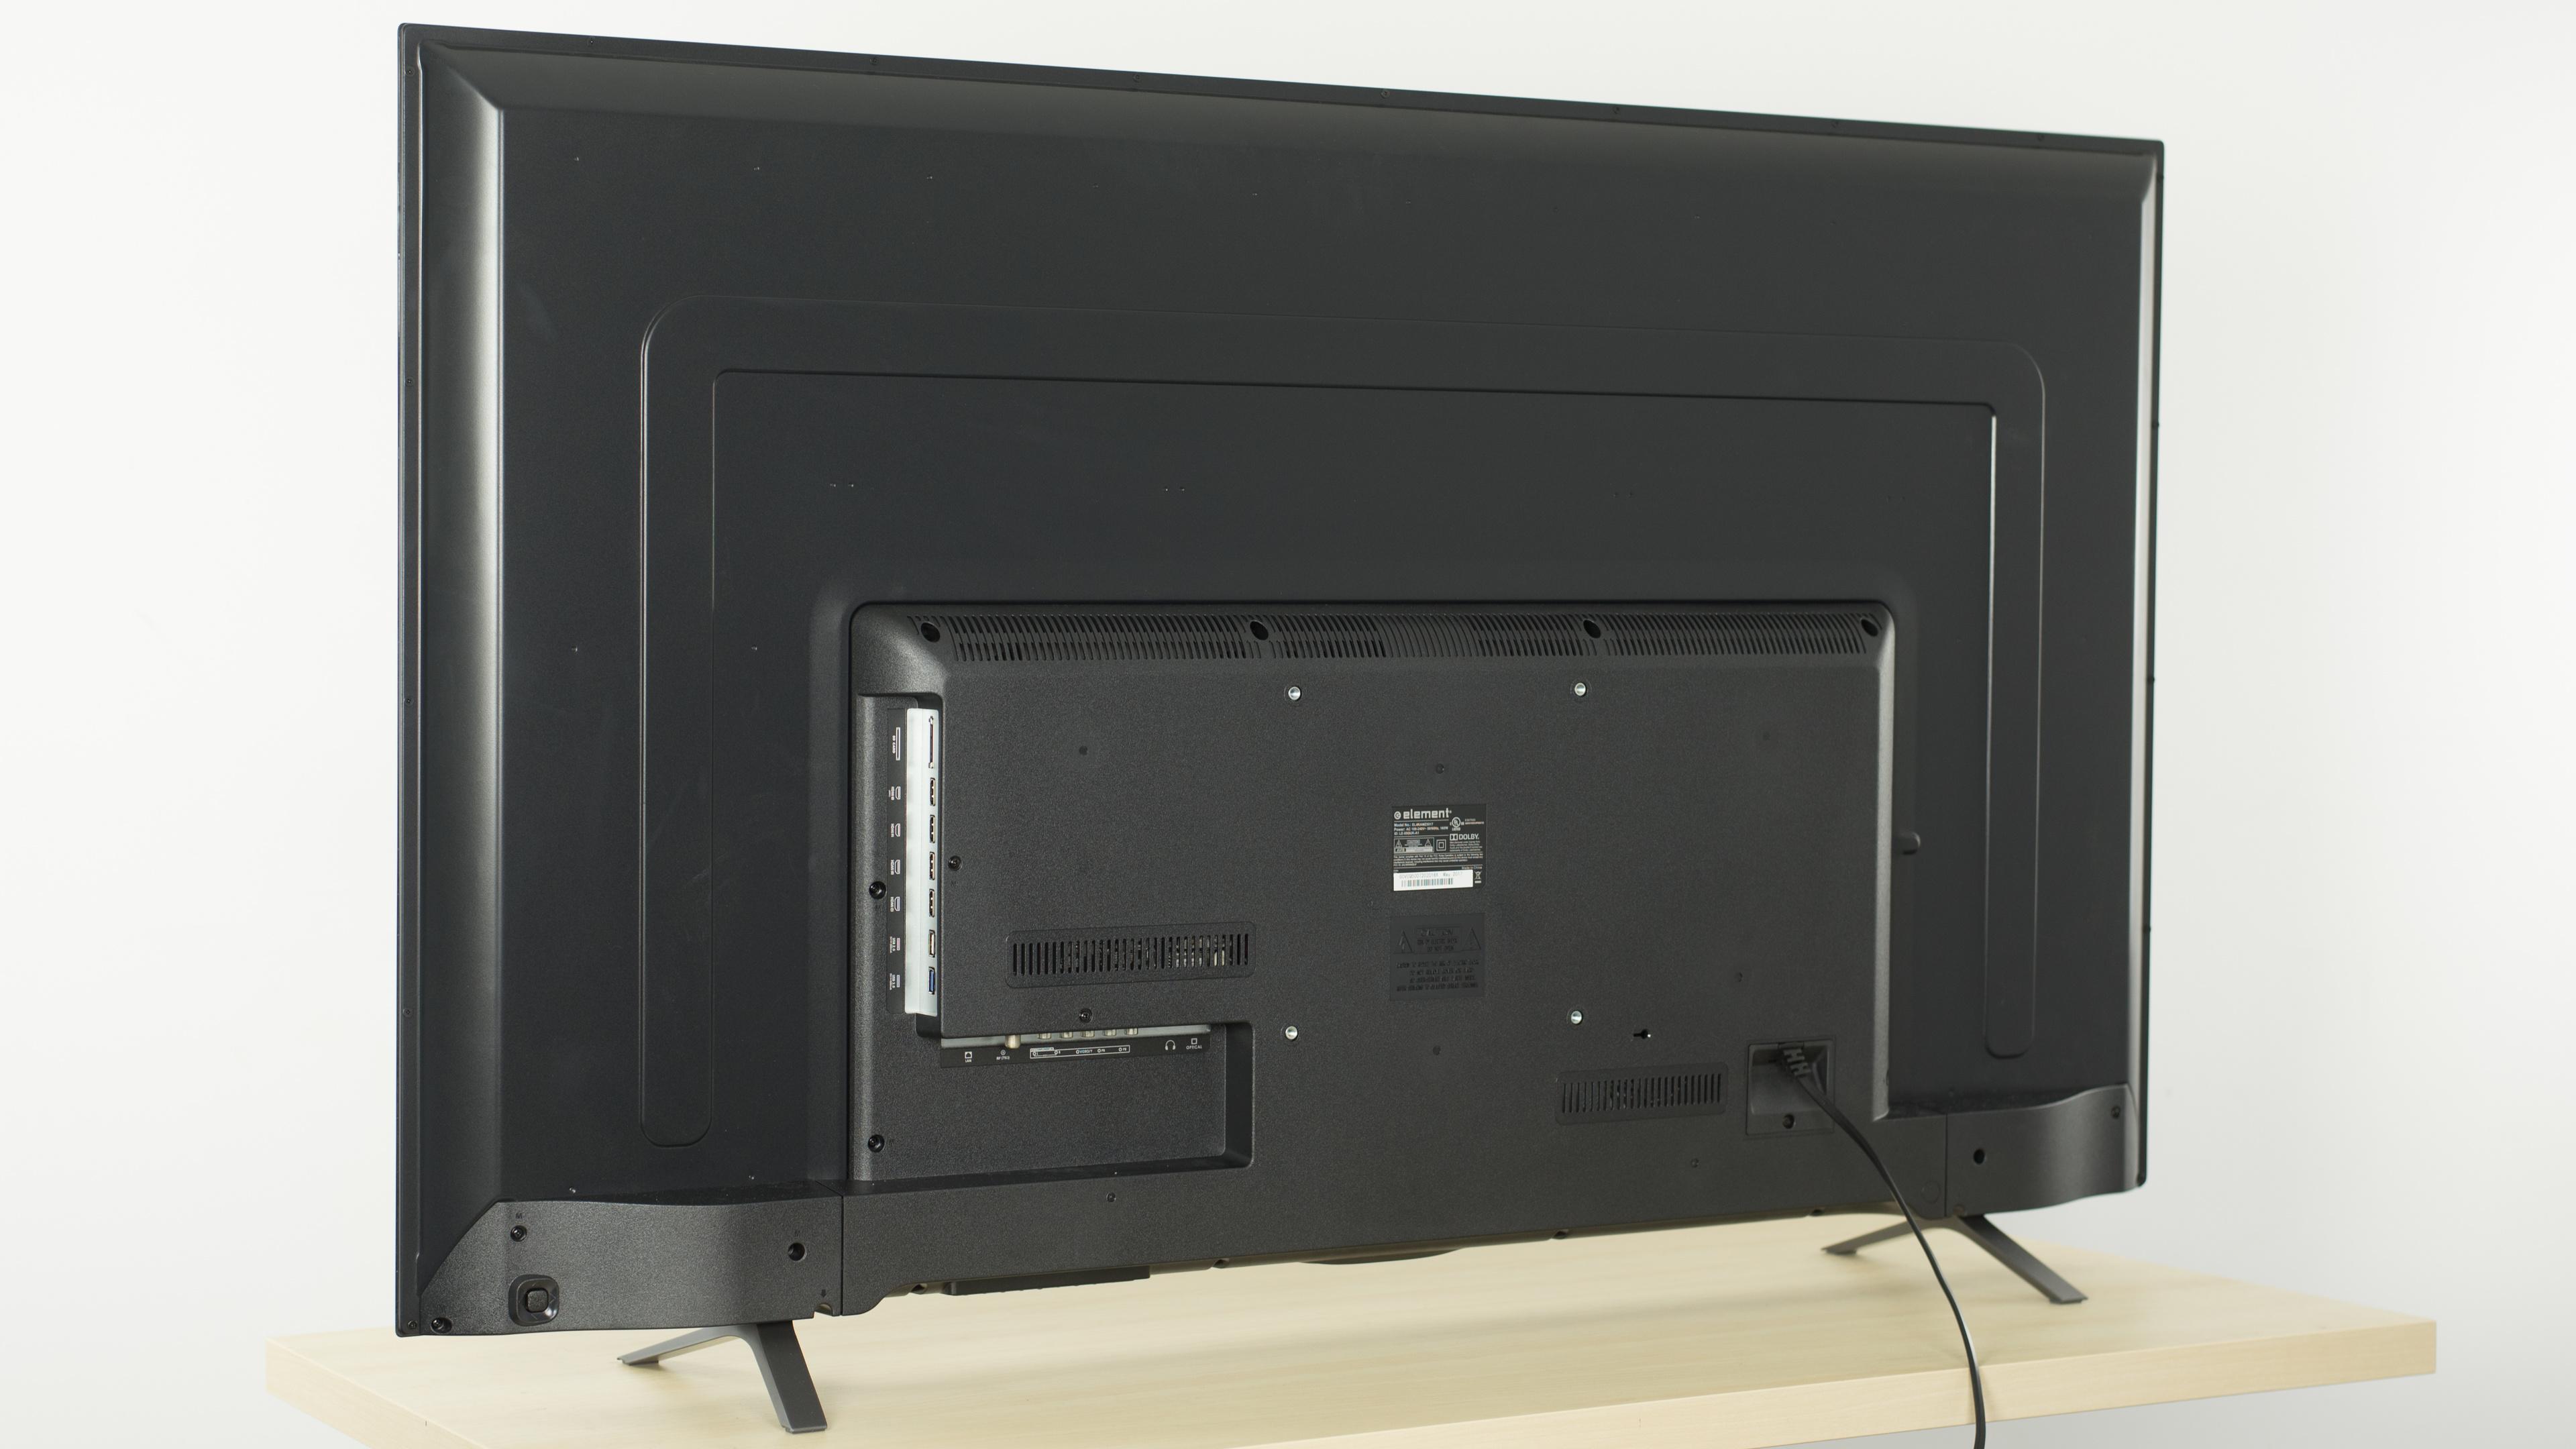 Element Amazon Fire Tv Review El4kamz4317 El4kamz5017